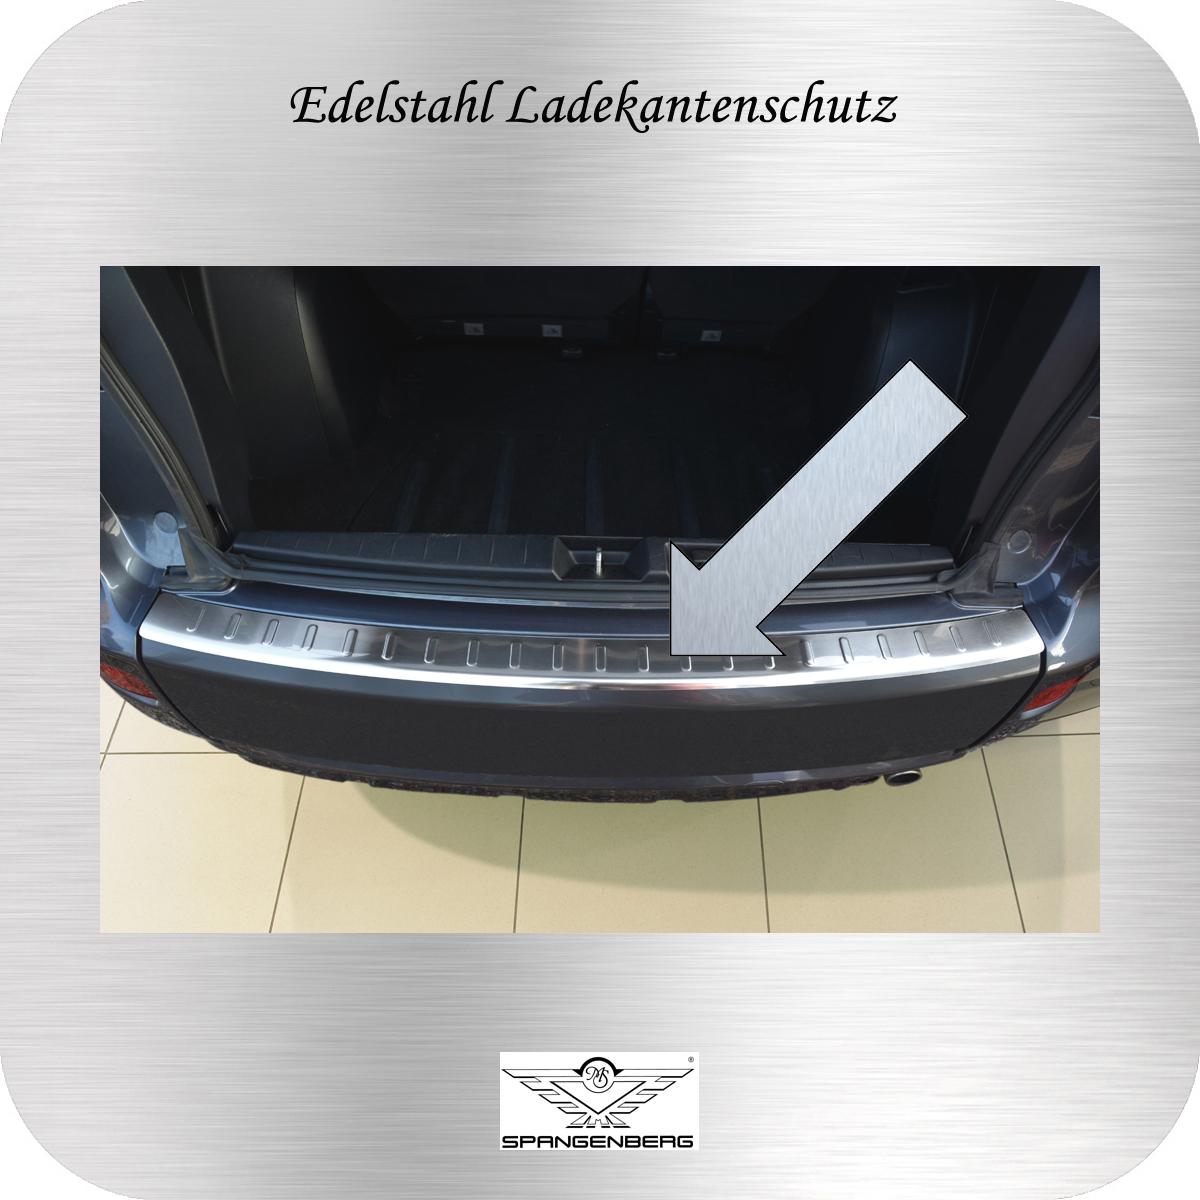 Ladekantenschutz Edelstahl Mitsubishi Outlander II 2006-2012 3235015